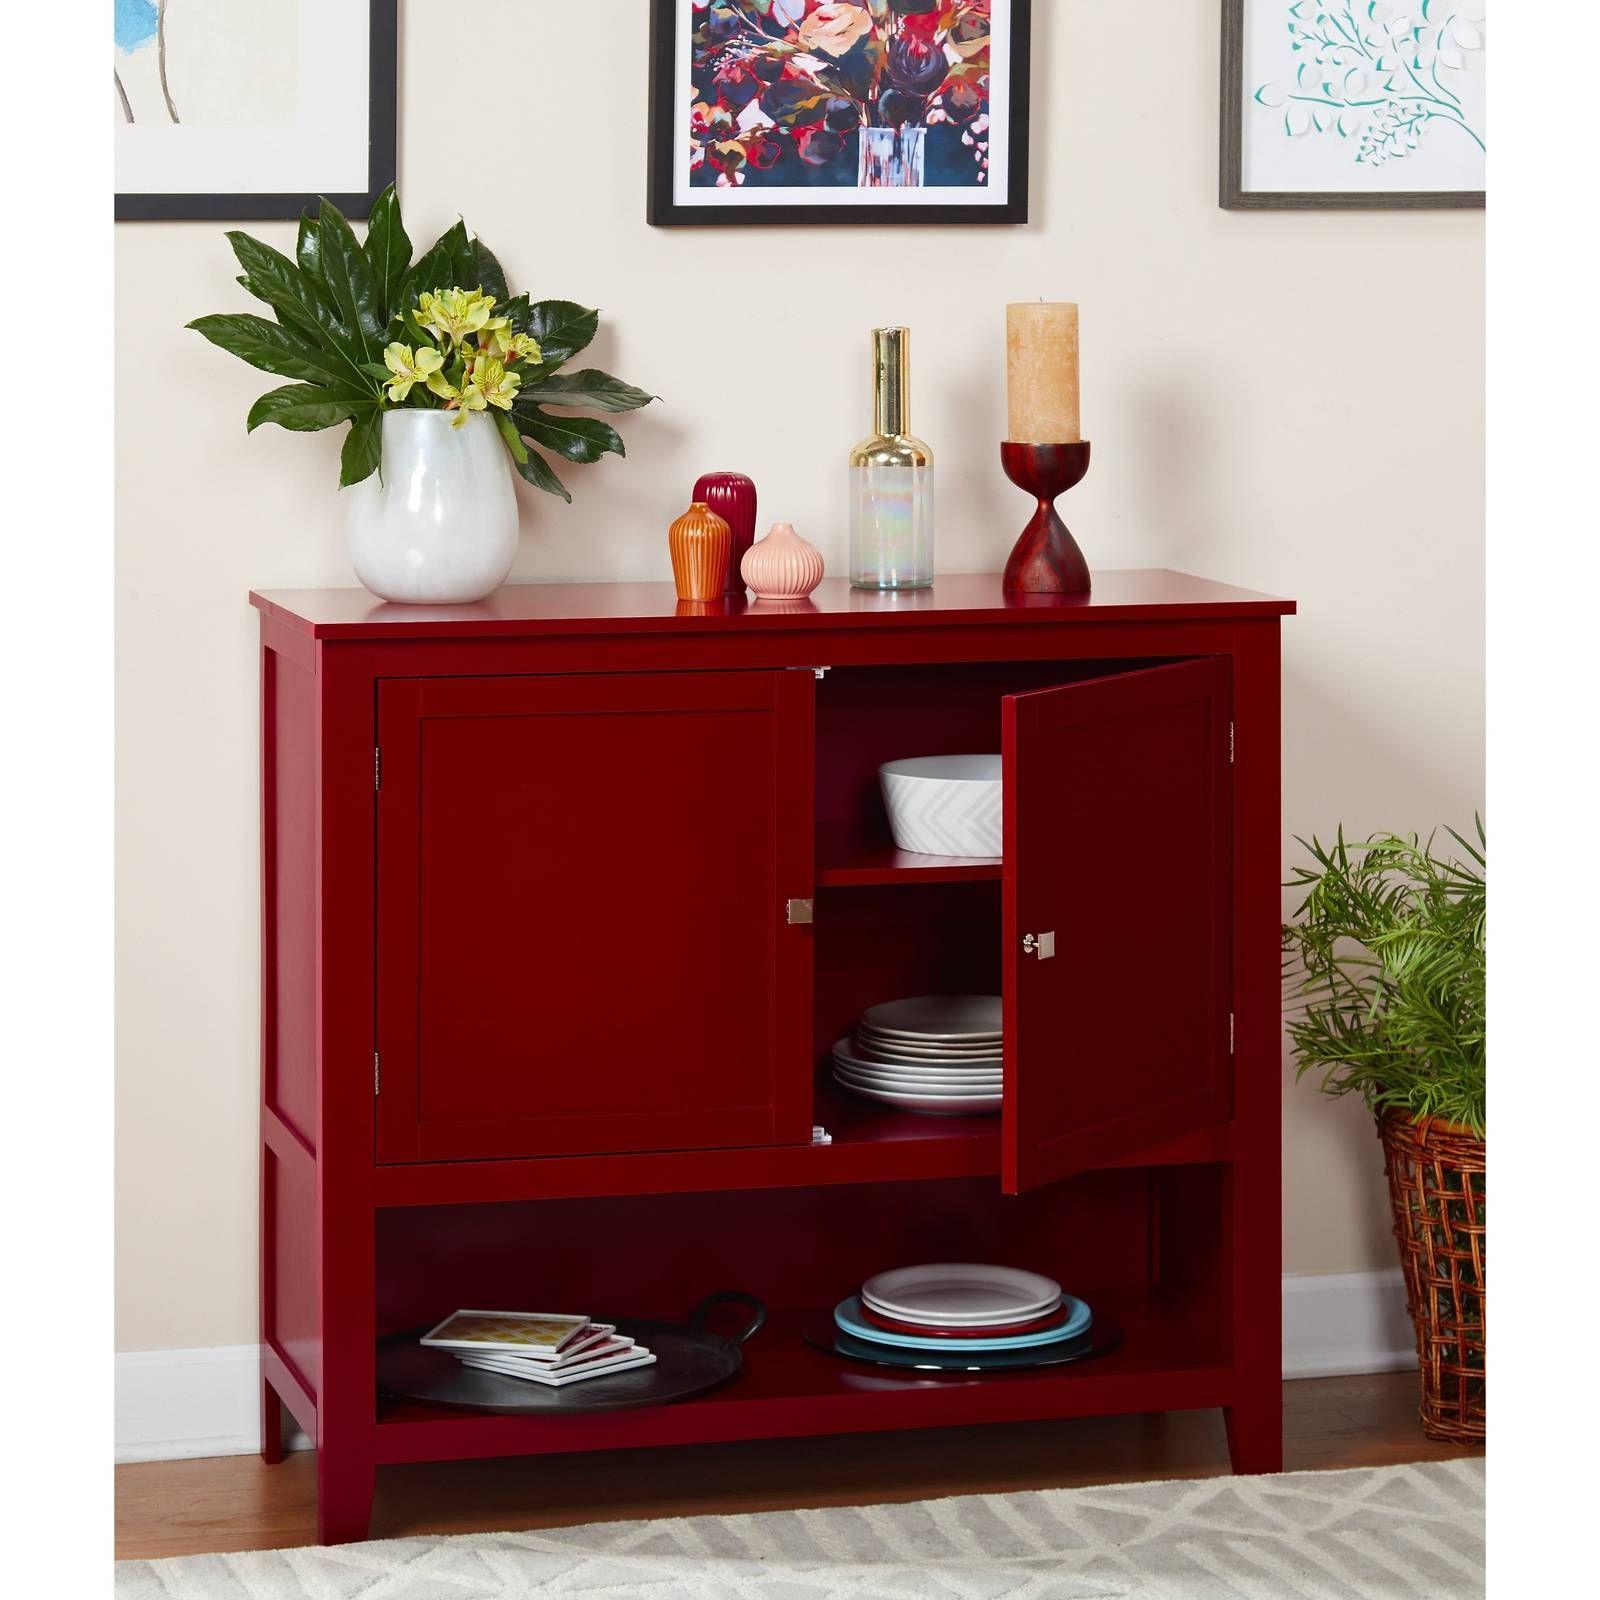 Pincheryl Schantz On Reno Ideas | Dining Room Bar, Bar Inside Simple Living Montego Black Wooden Buffets (View 5 of 20)